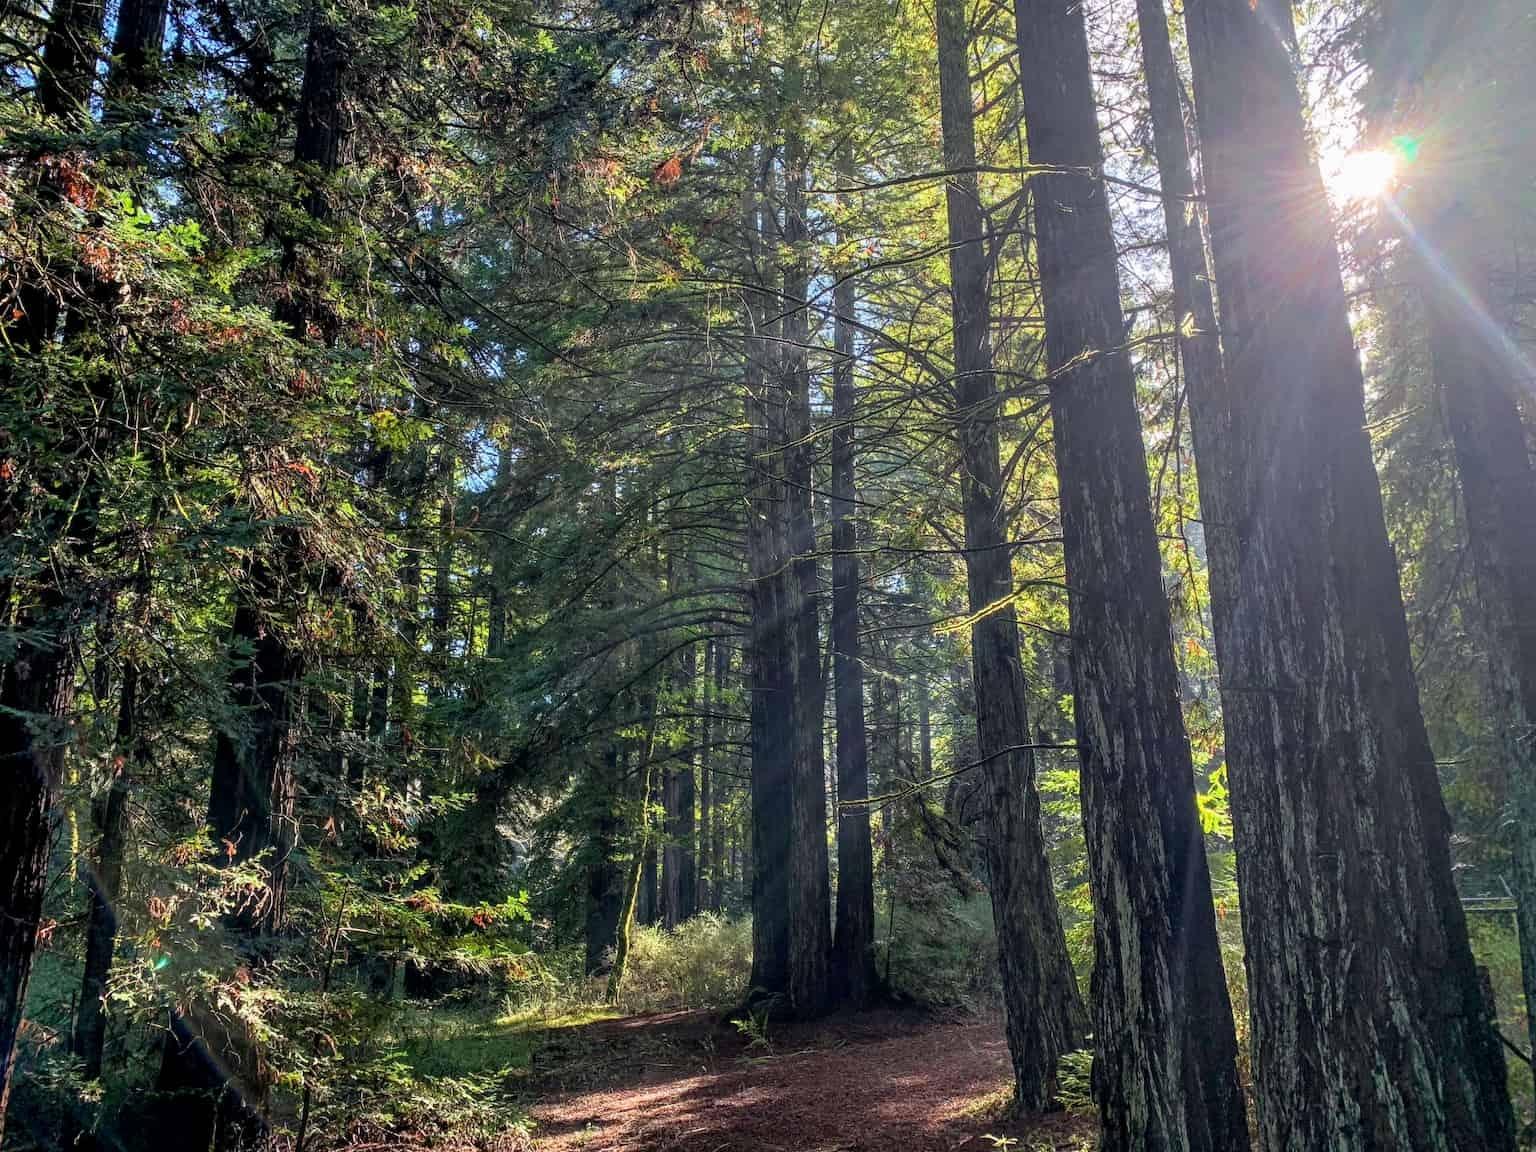 Trees near Big Basin Redwoods State Park